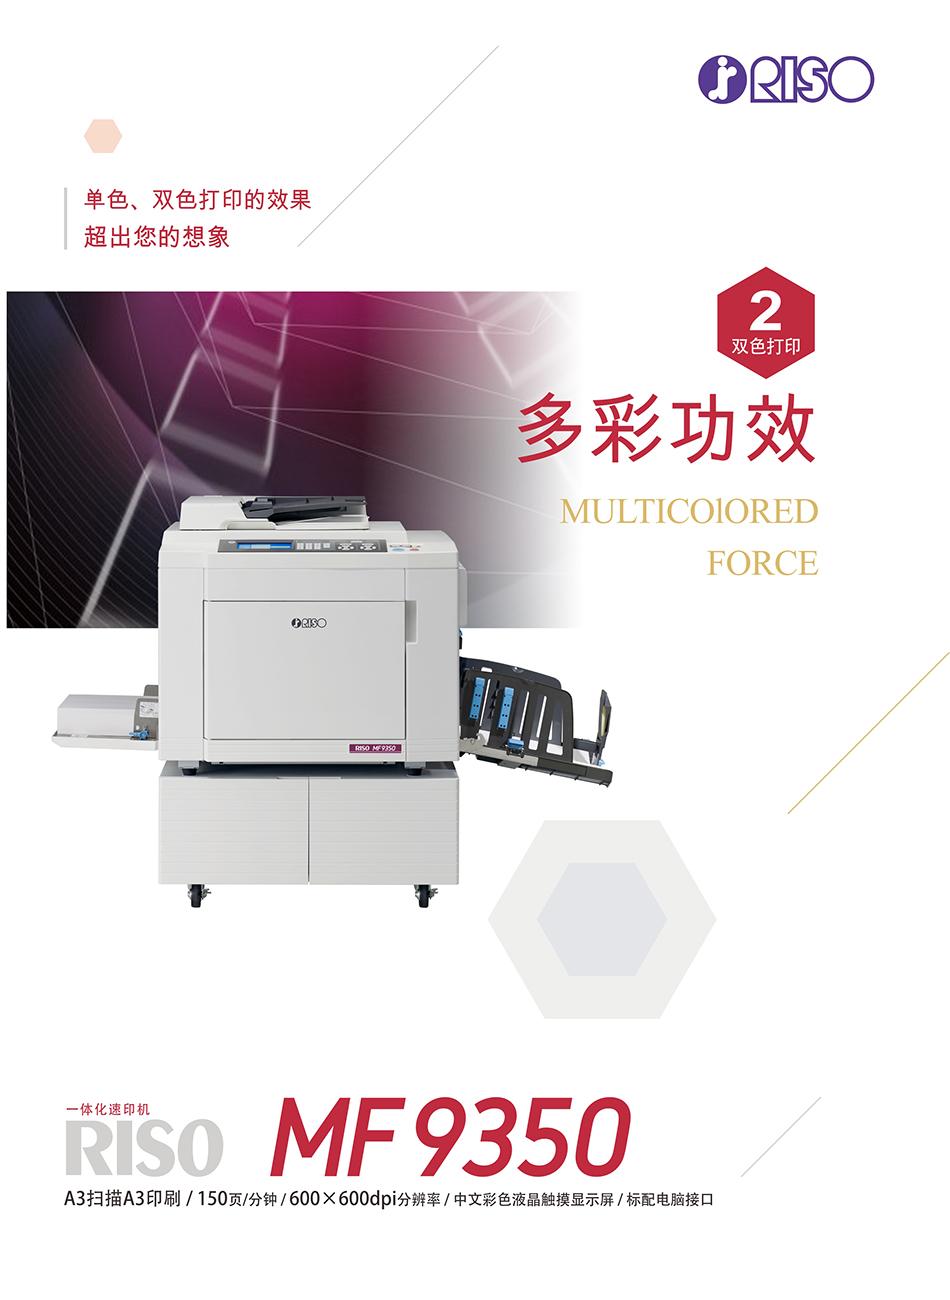 MF9350彩页--1-950.jpg